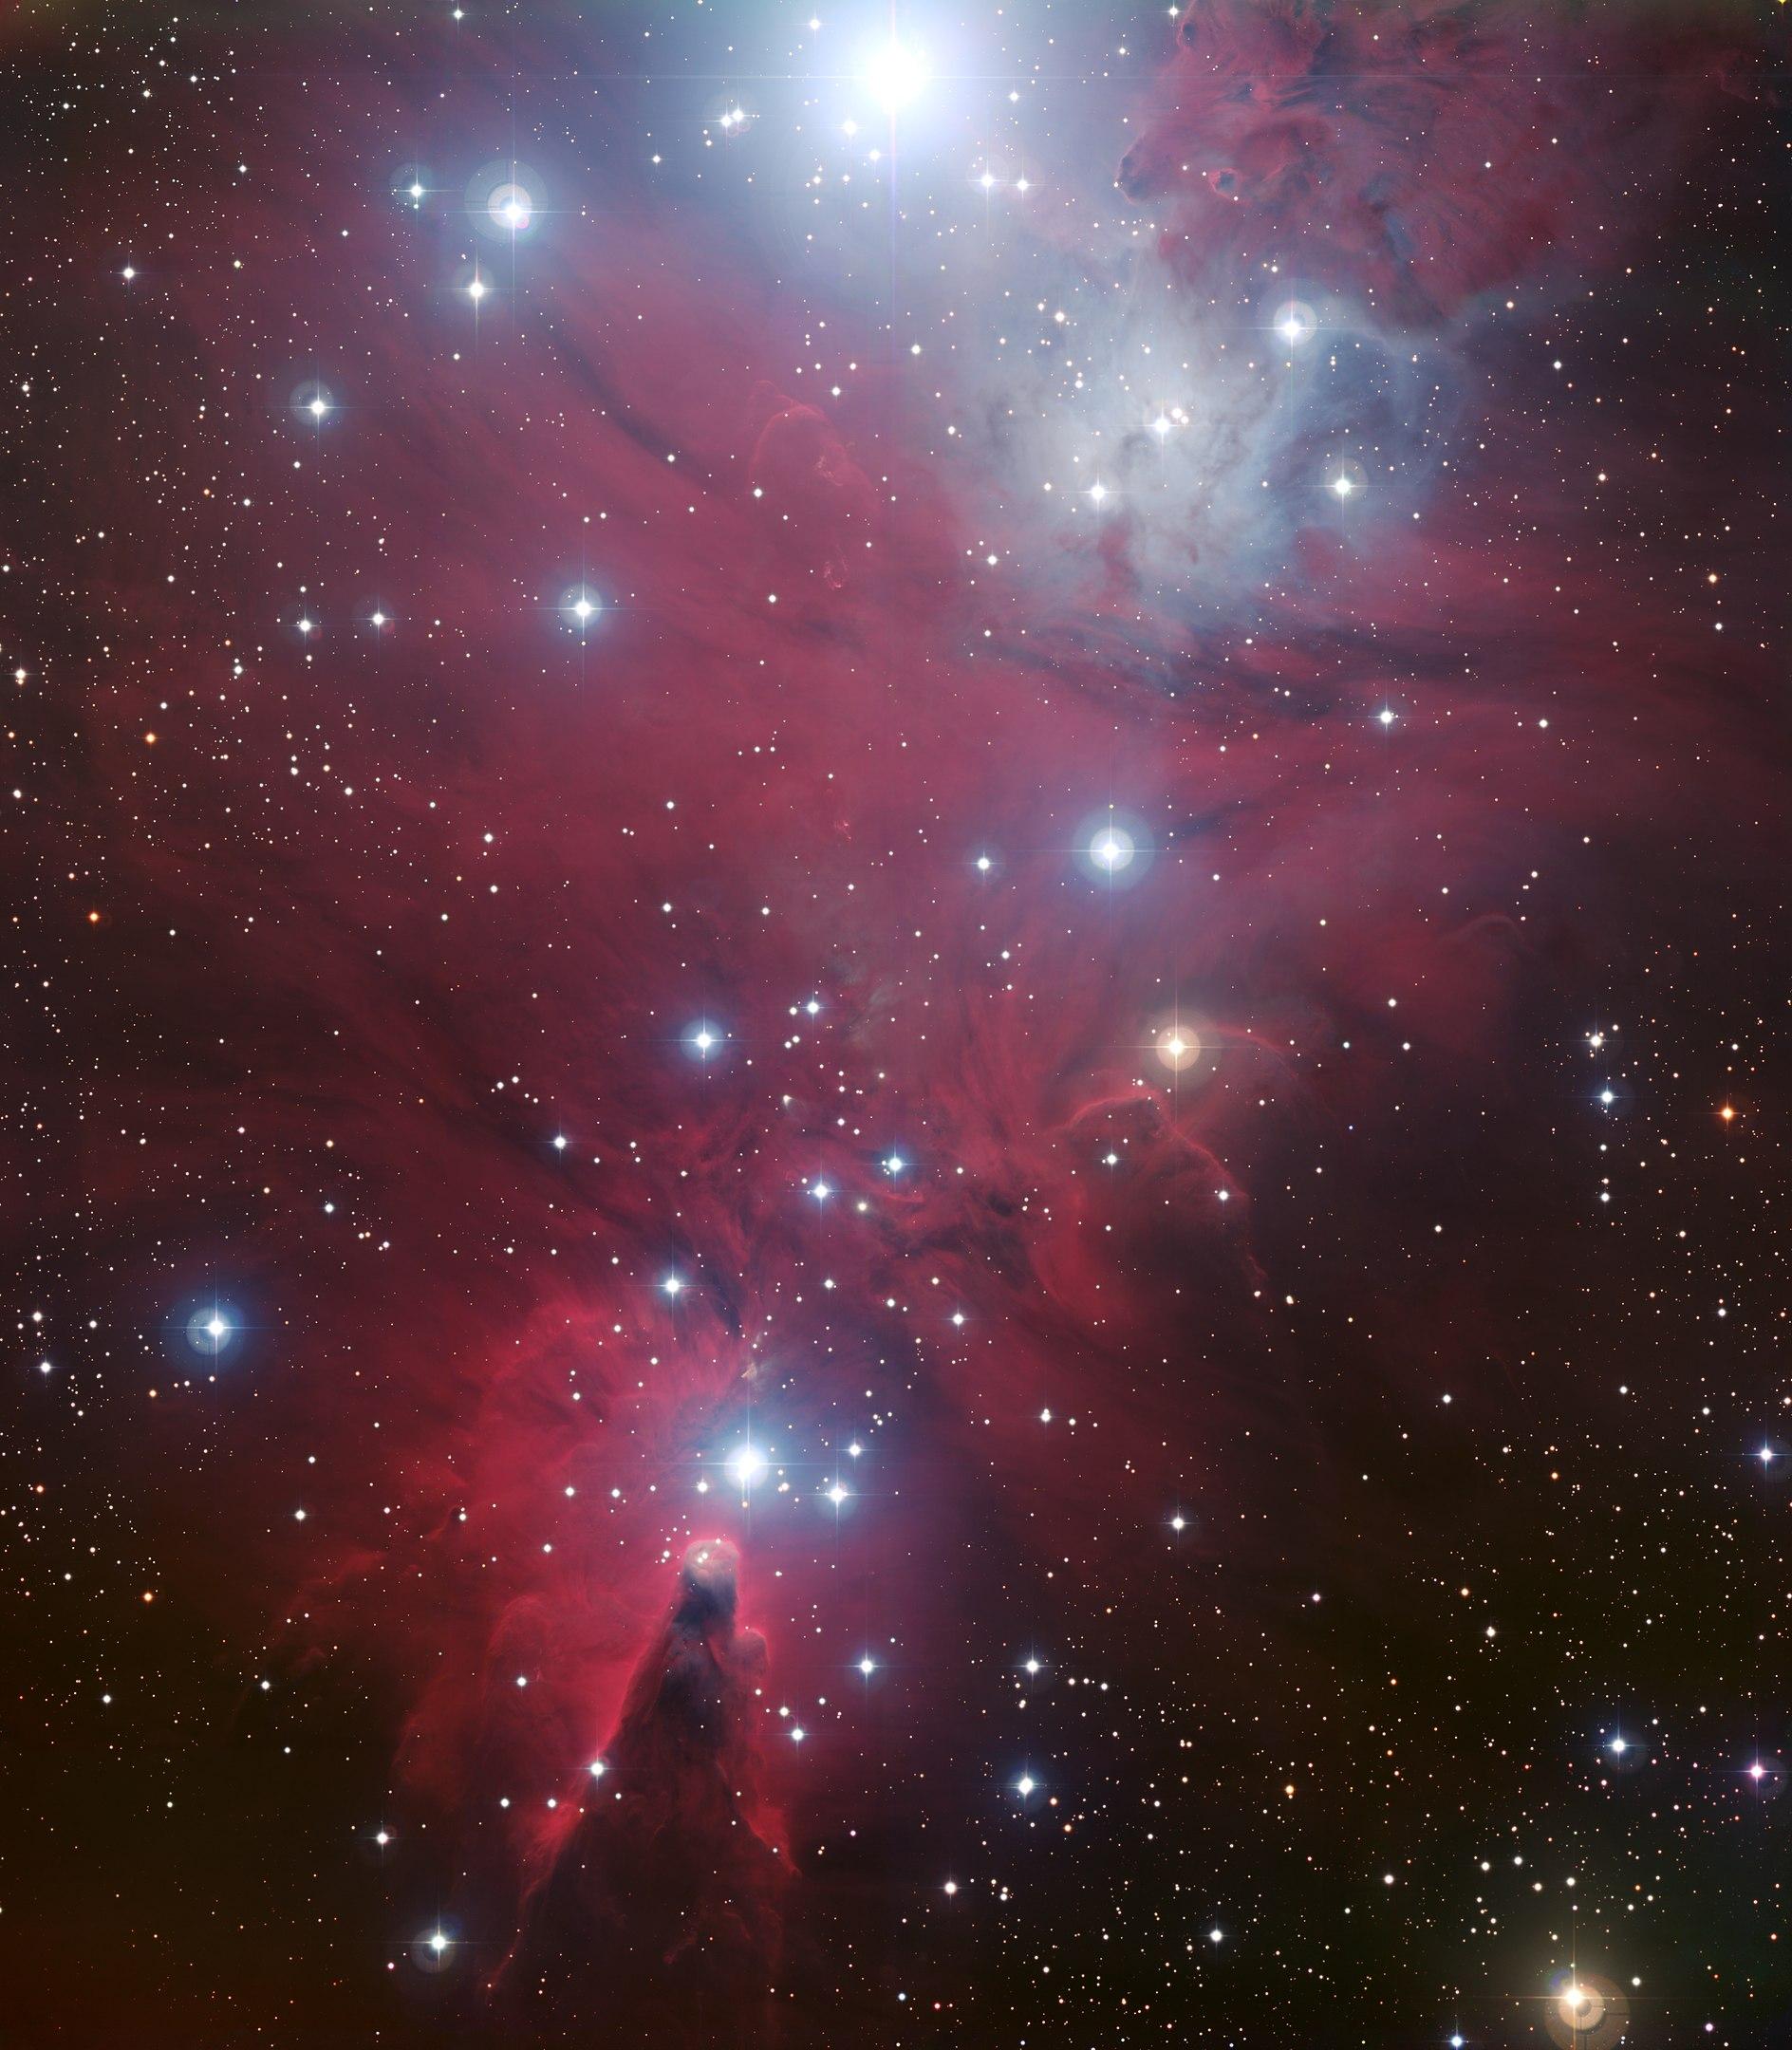 NGC 2264 star cluster, Monoceros